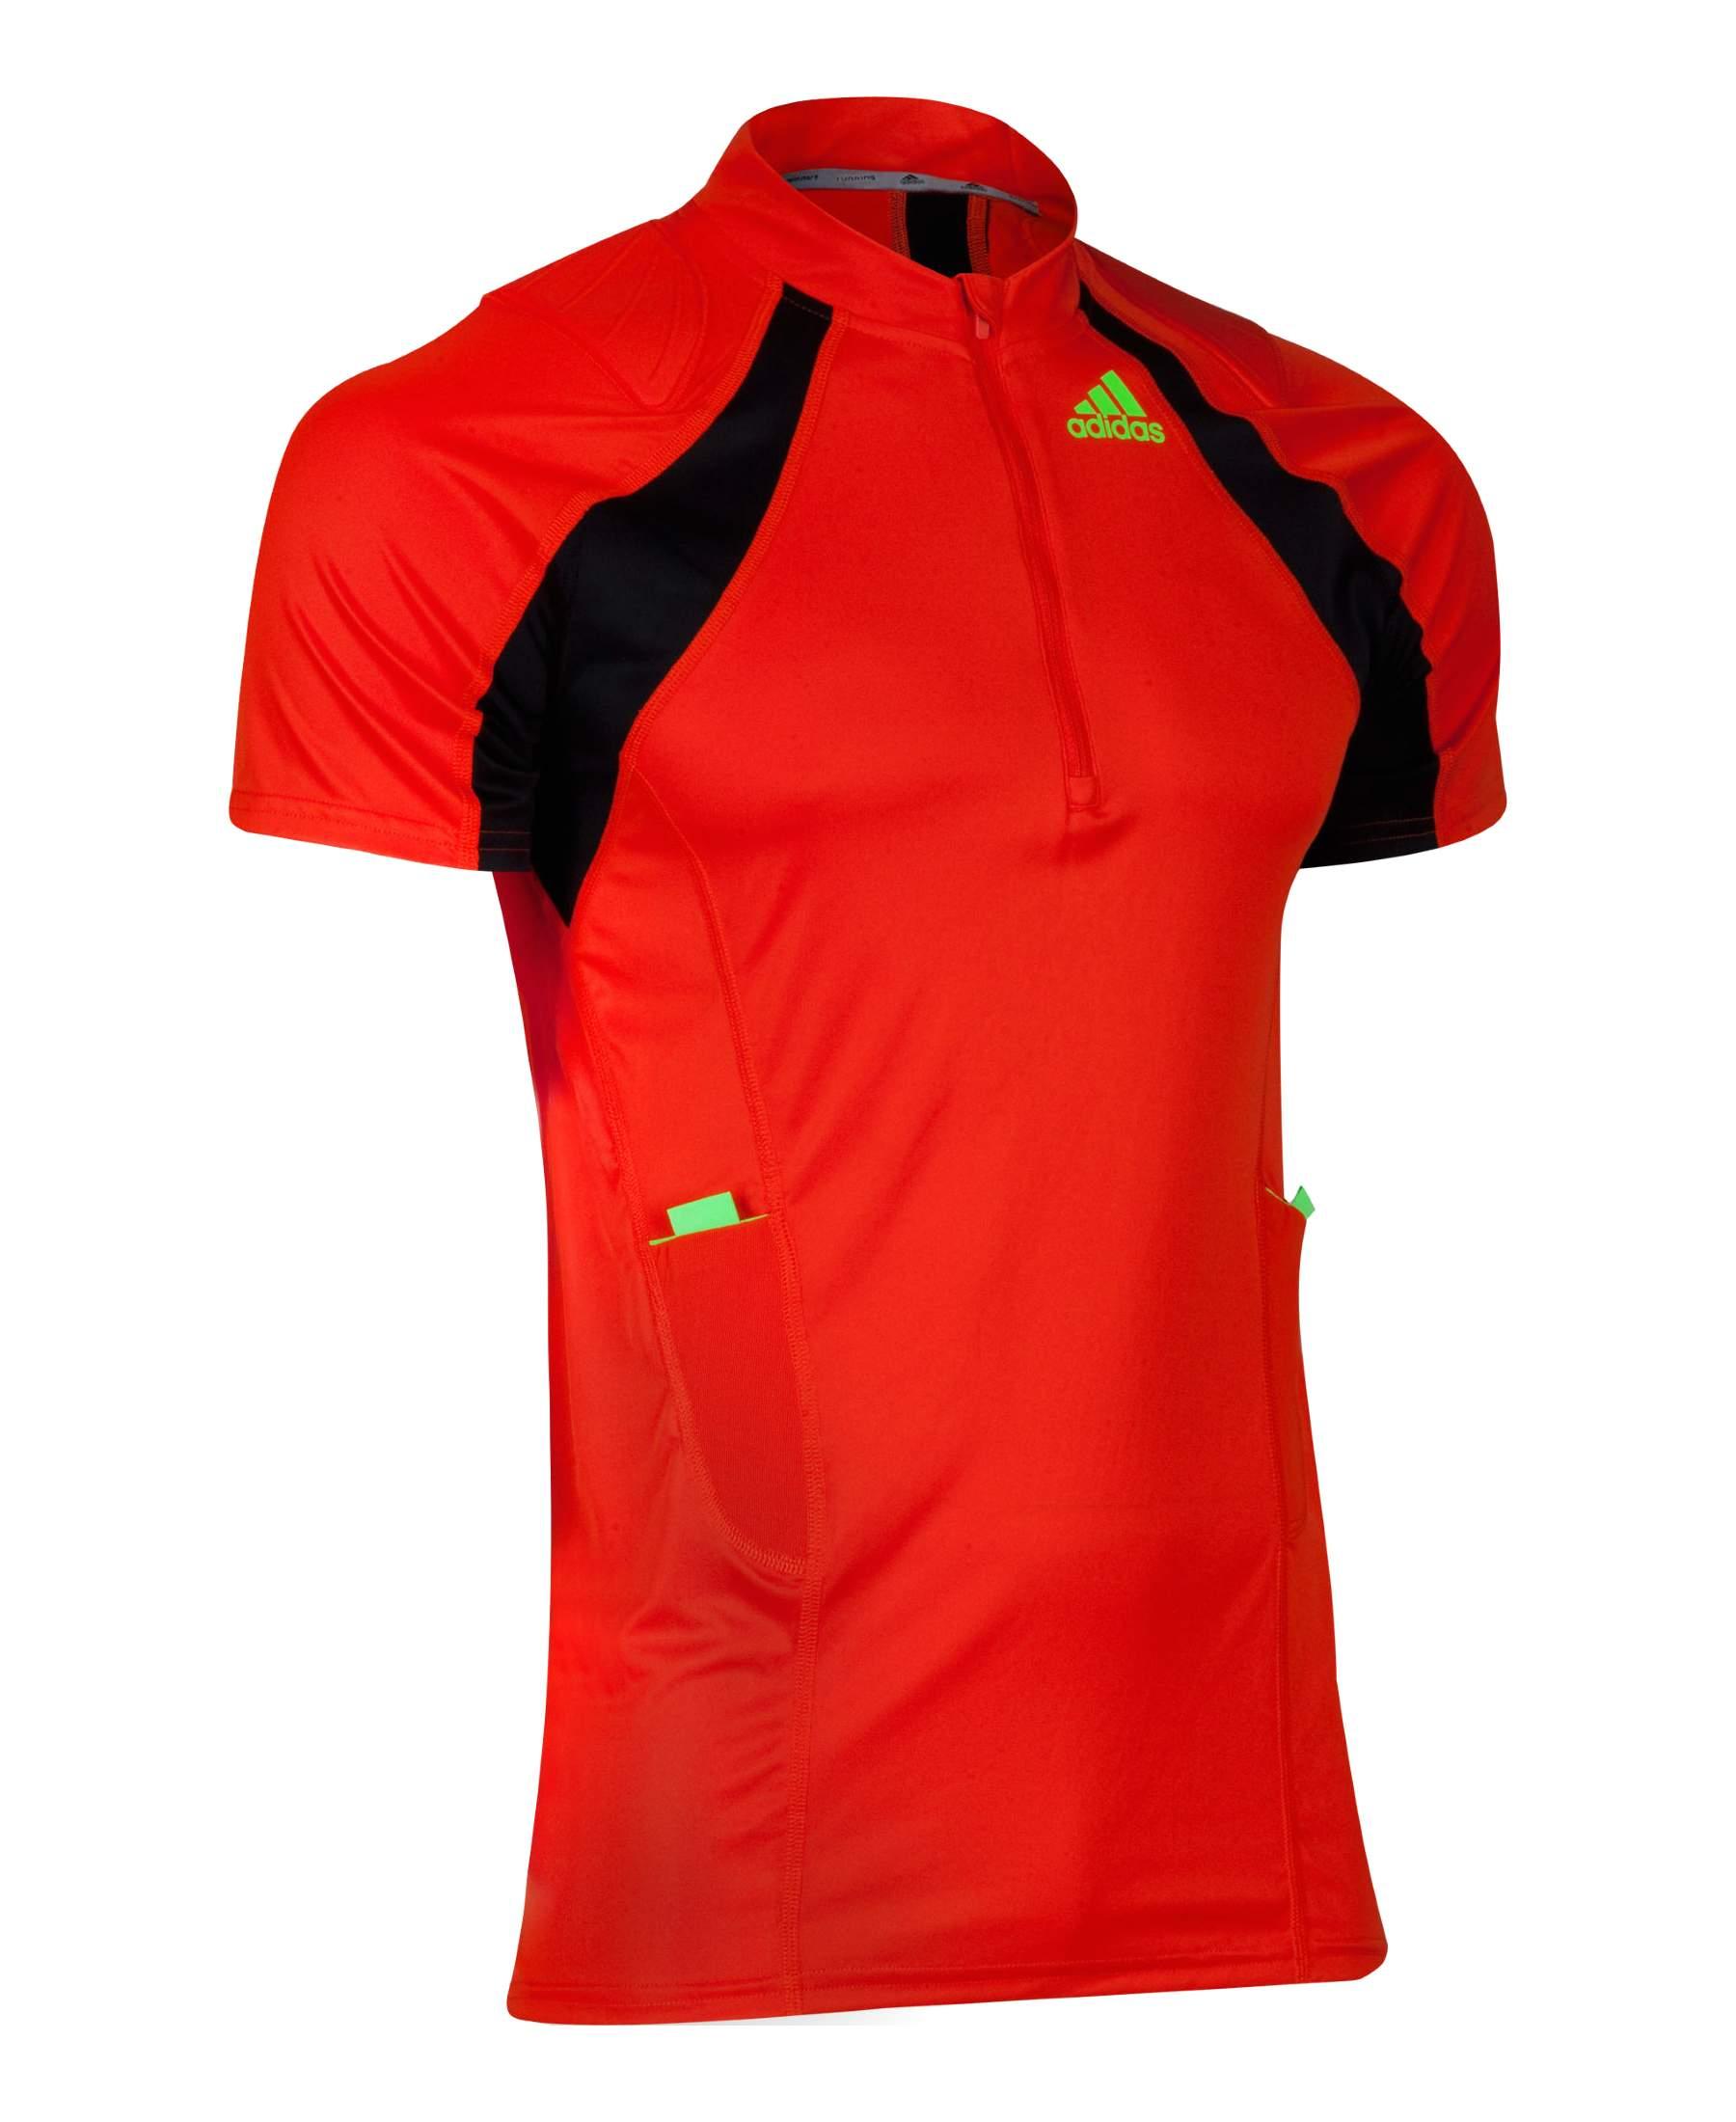 Hola Pickering Miedo a morir  Adidas Para Hombre Naranja Negro Trail Run 1/2 Cremallera Manga Corta  Camiseta | eBay